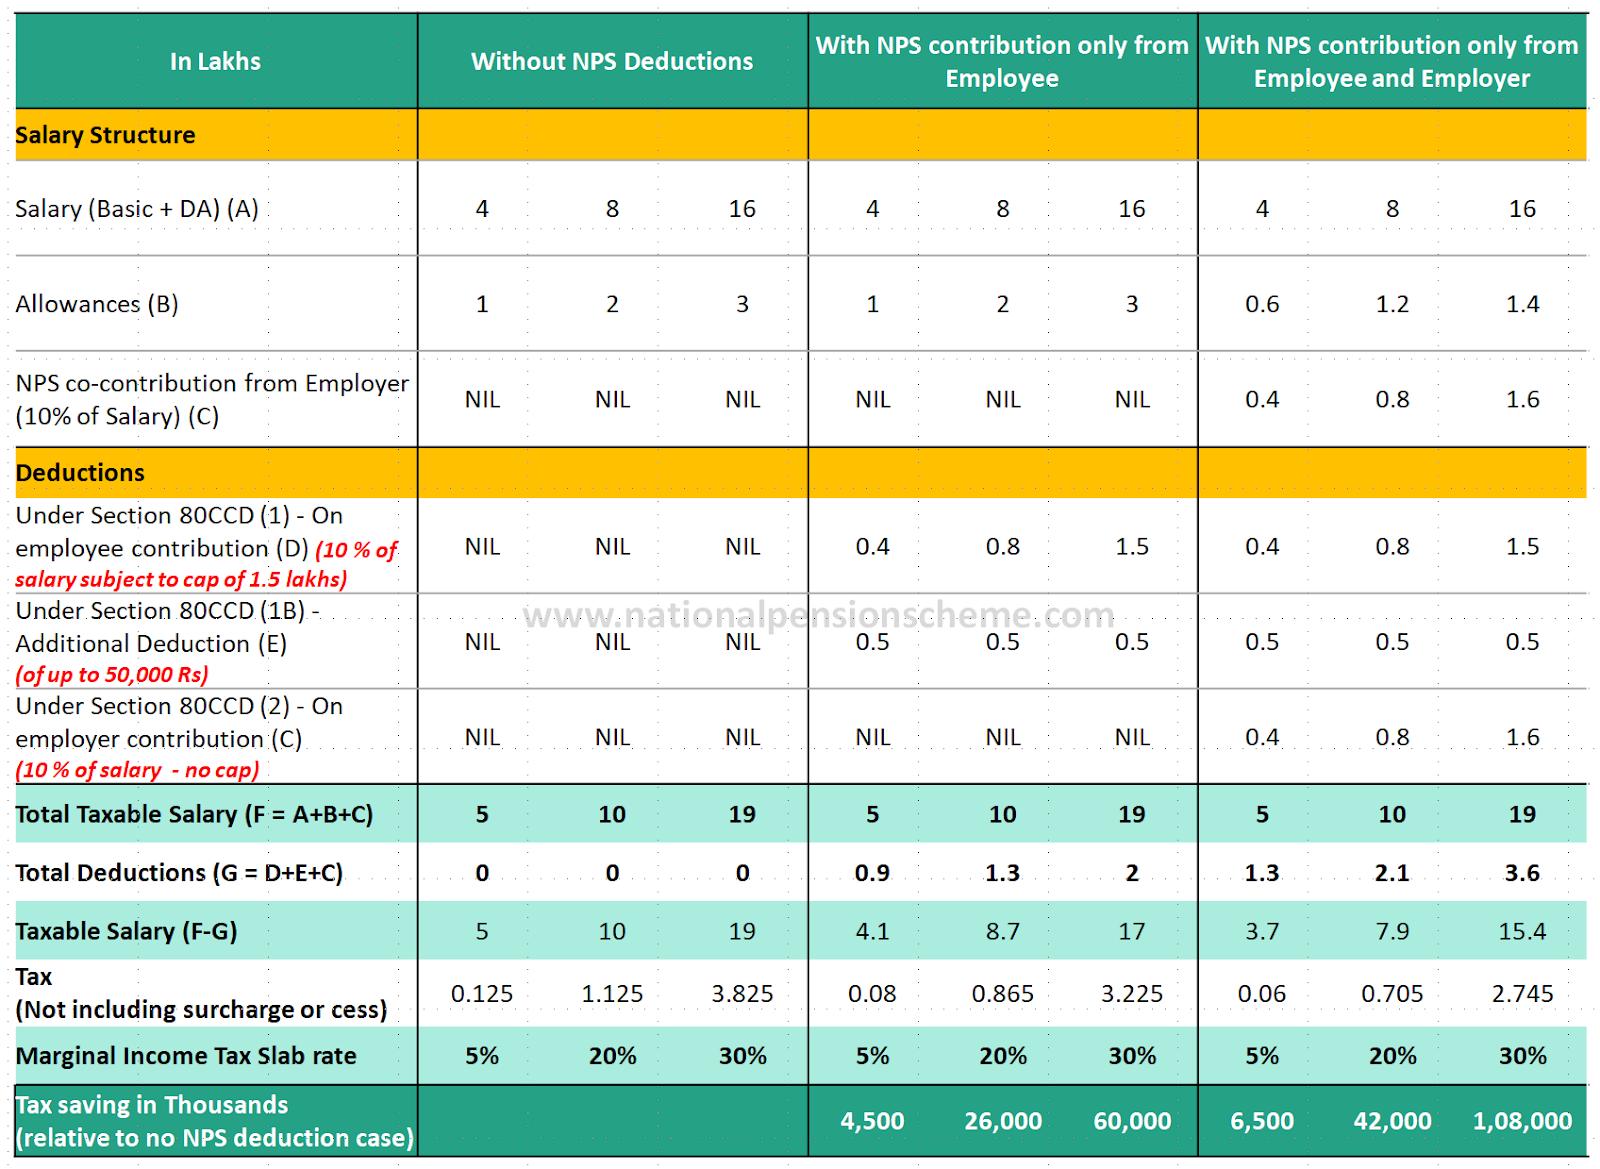 NPS Tax benefit illustration vs. no investment case